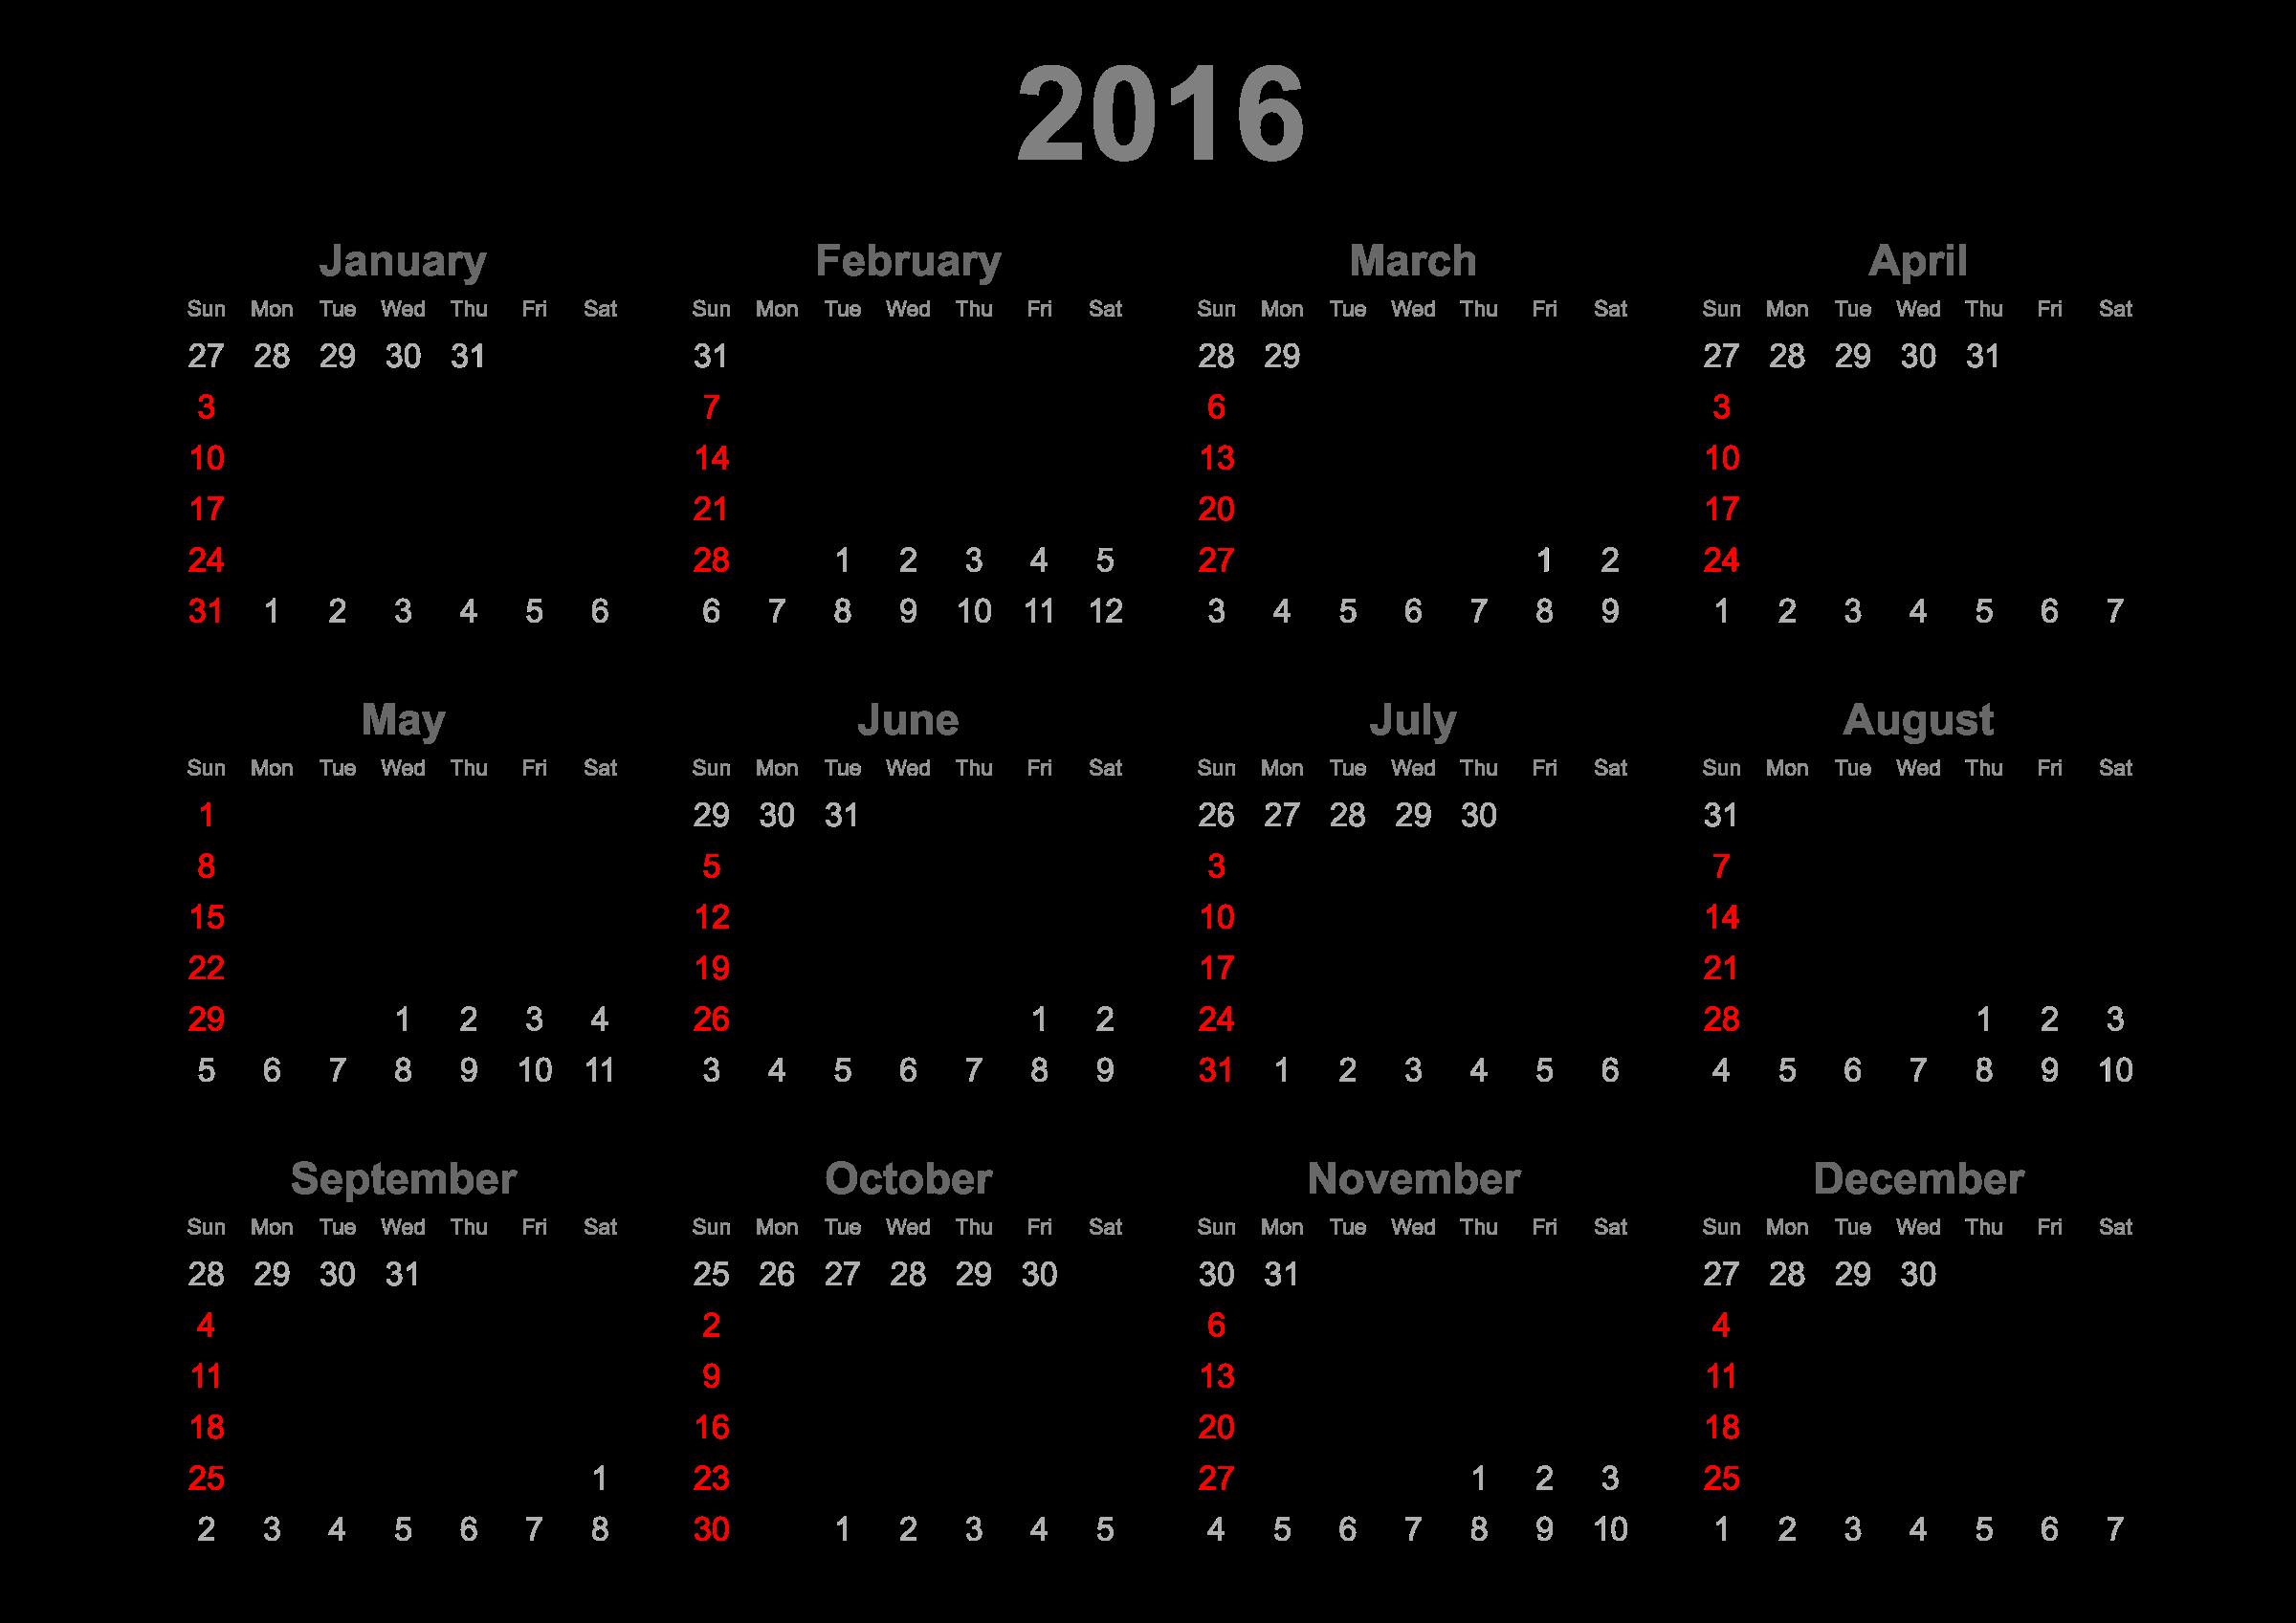 Calendar big image png. December clipart december 2016